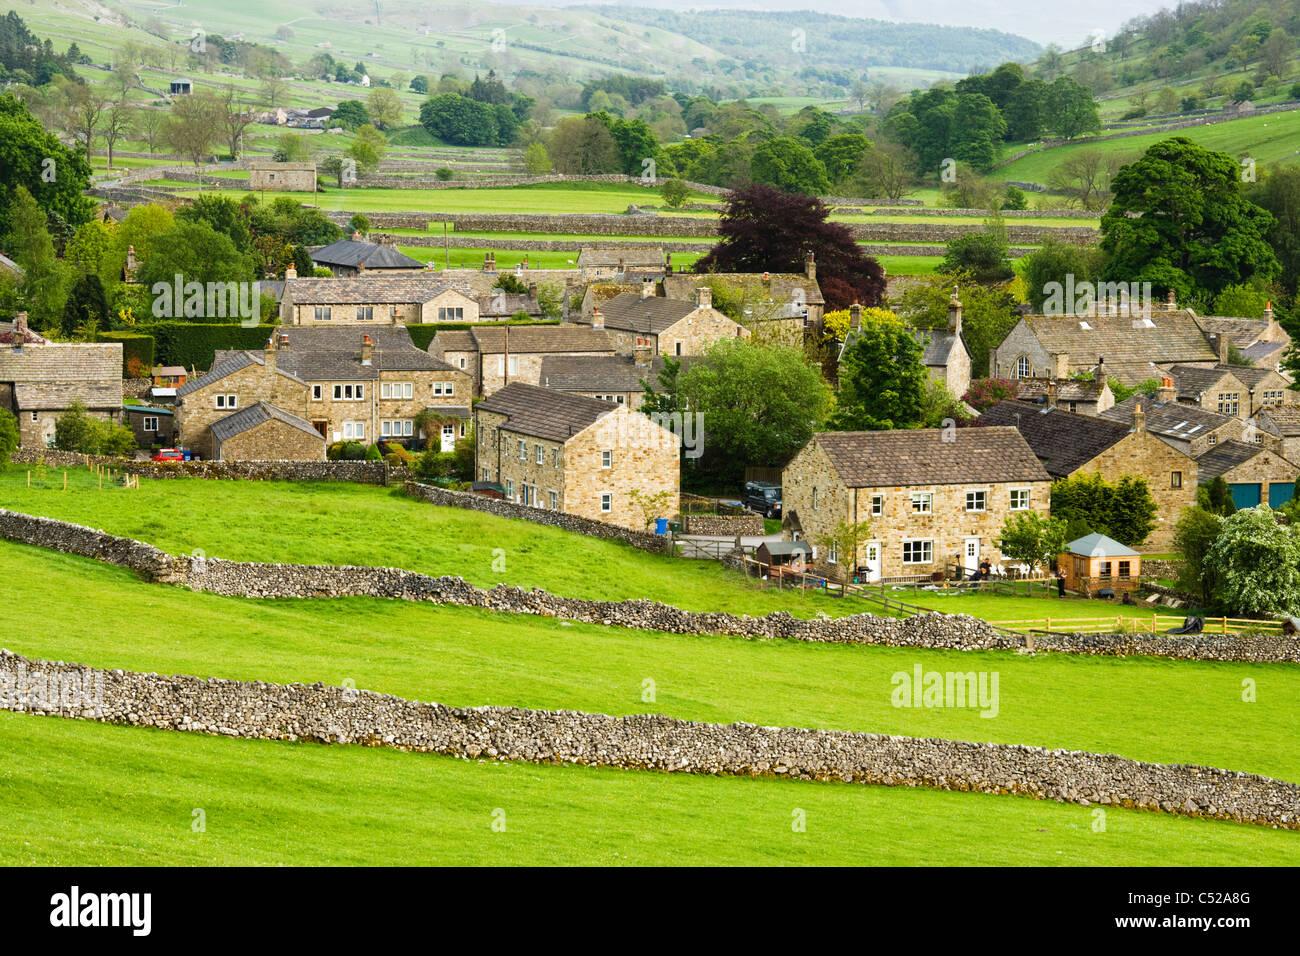 Kettlewell, Yorkshire Dales National Park, UK - Stock Image